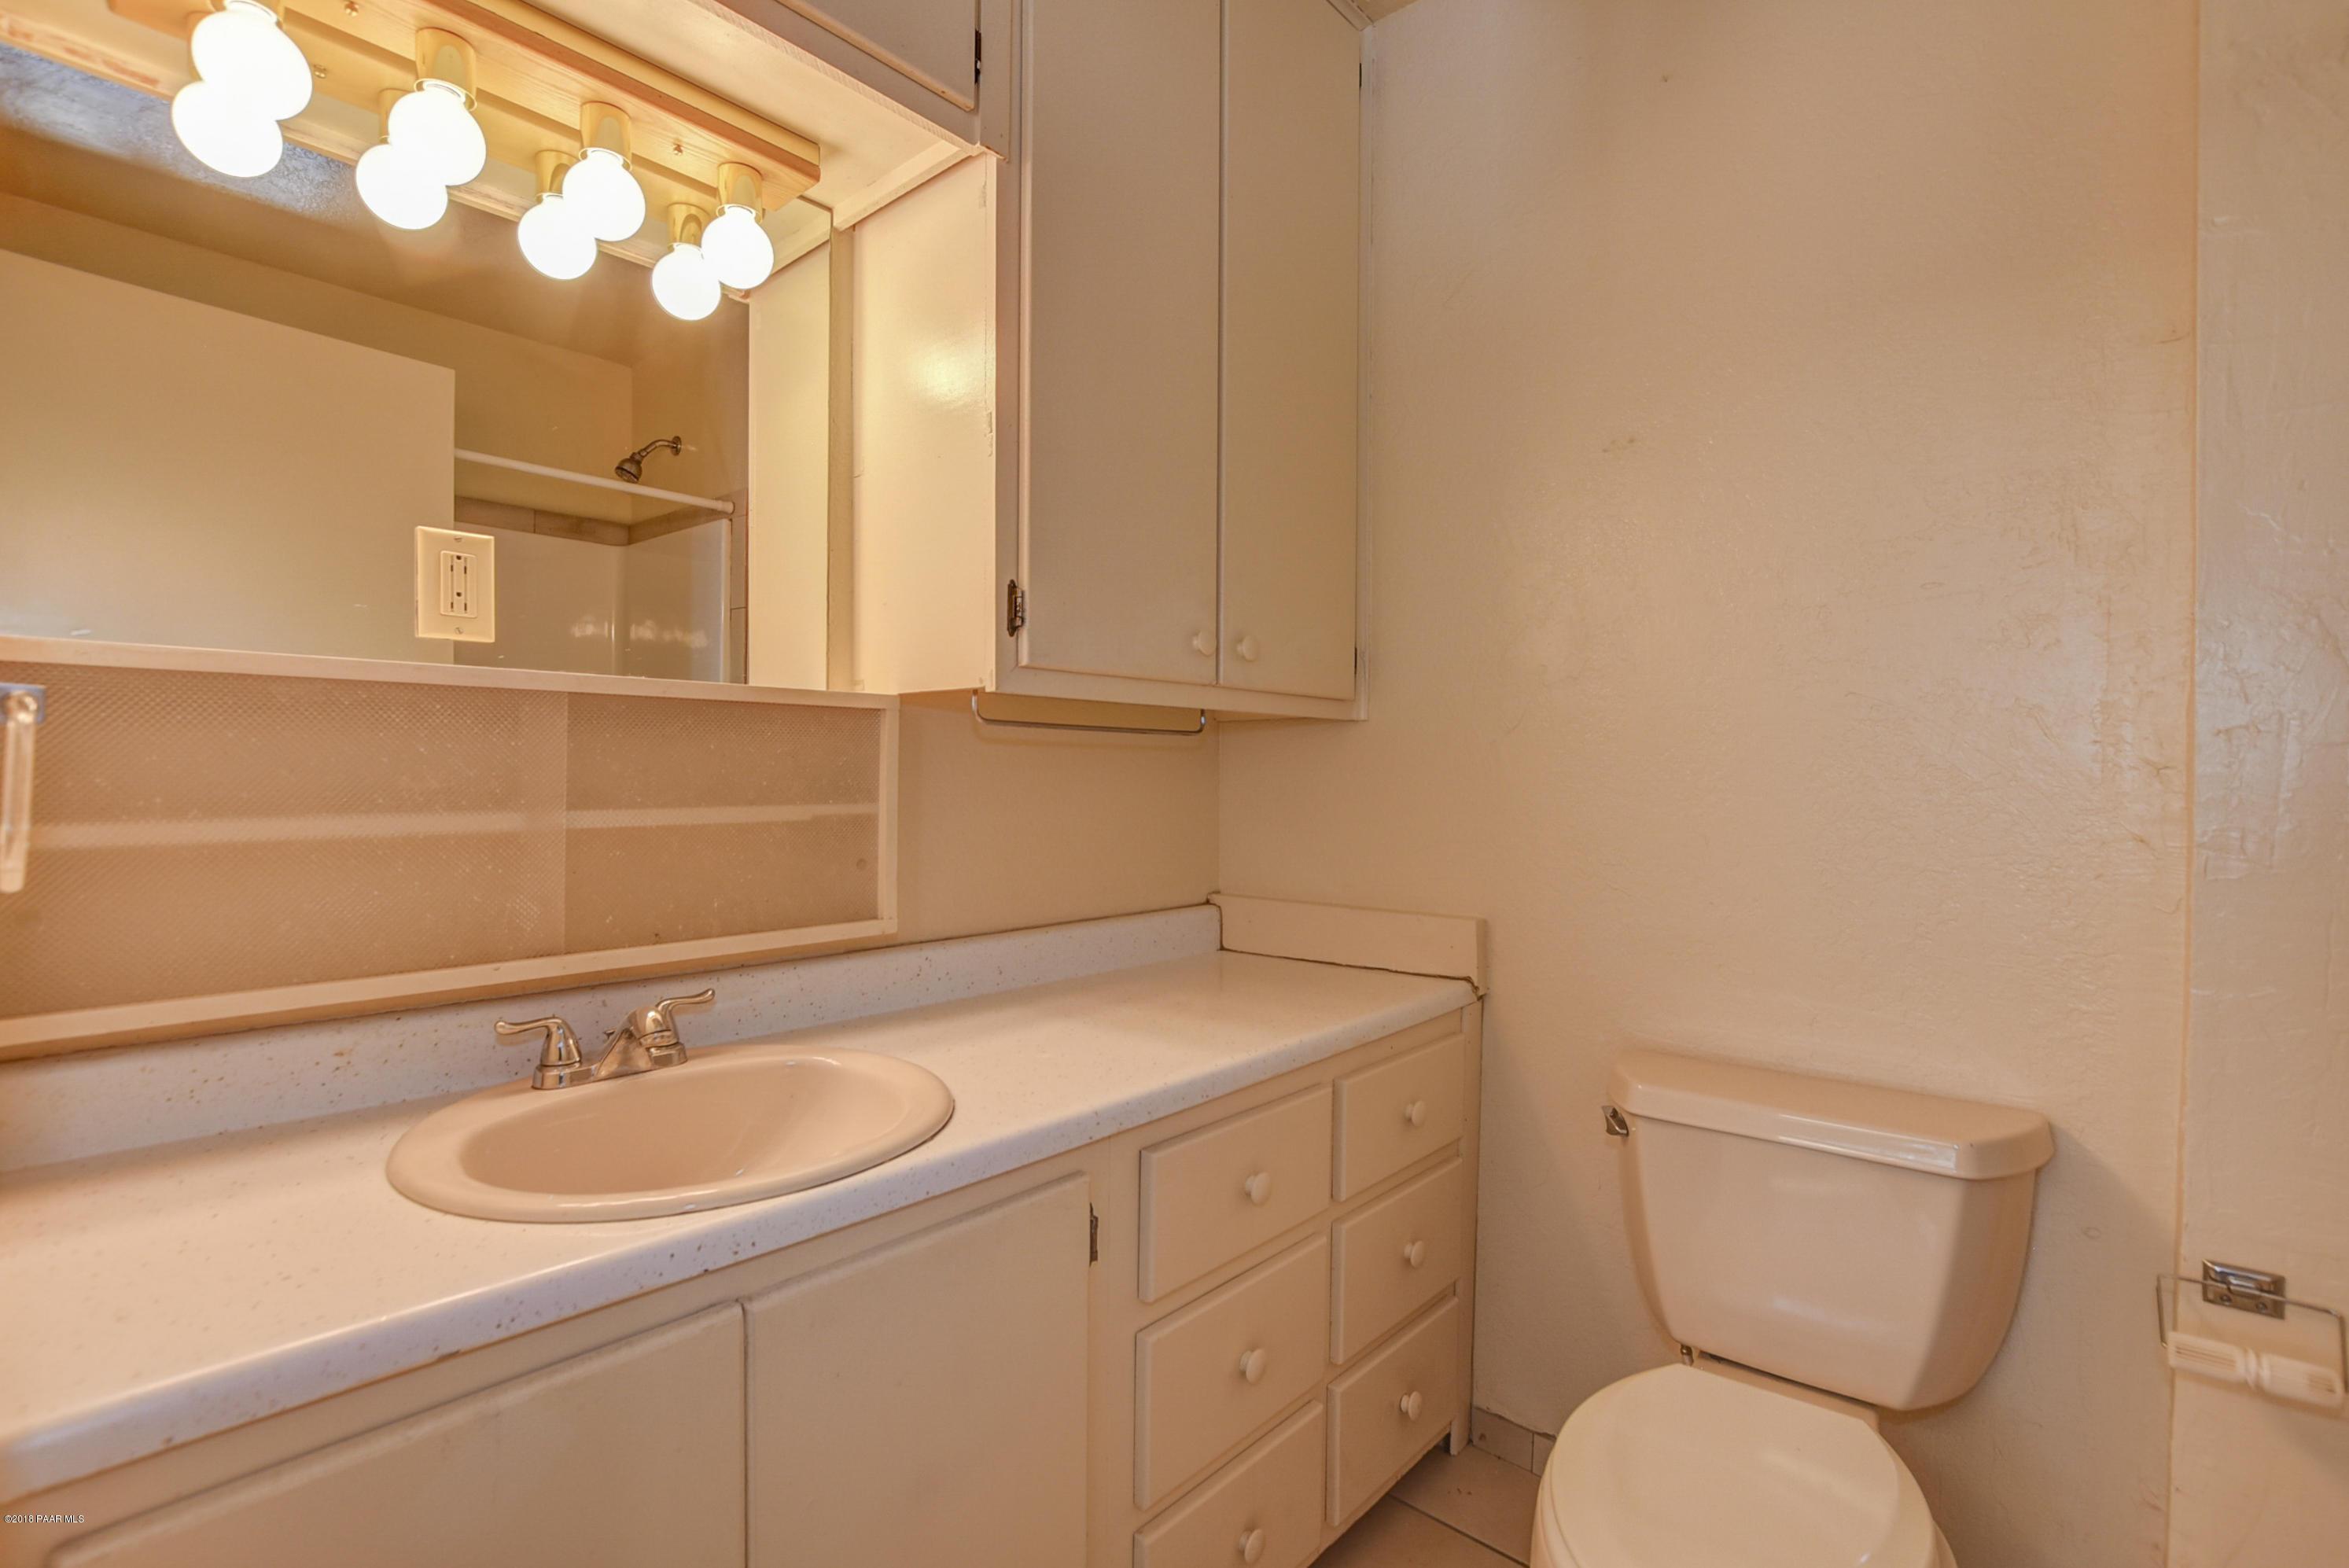 393 S Overland Road Prescott, AZ 86303 - MLS #: 1013515